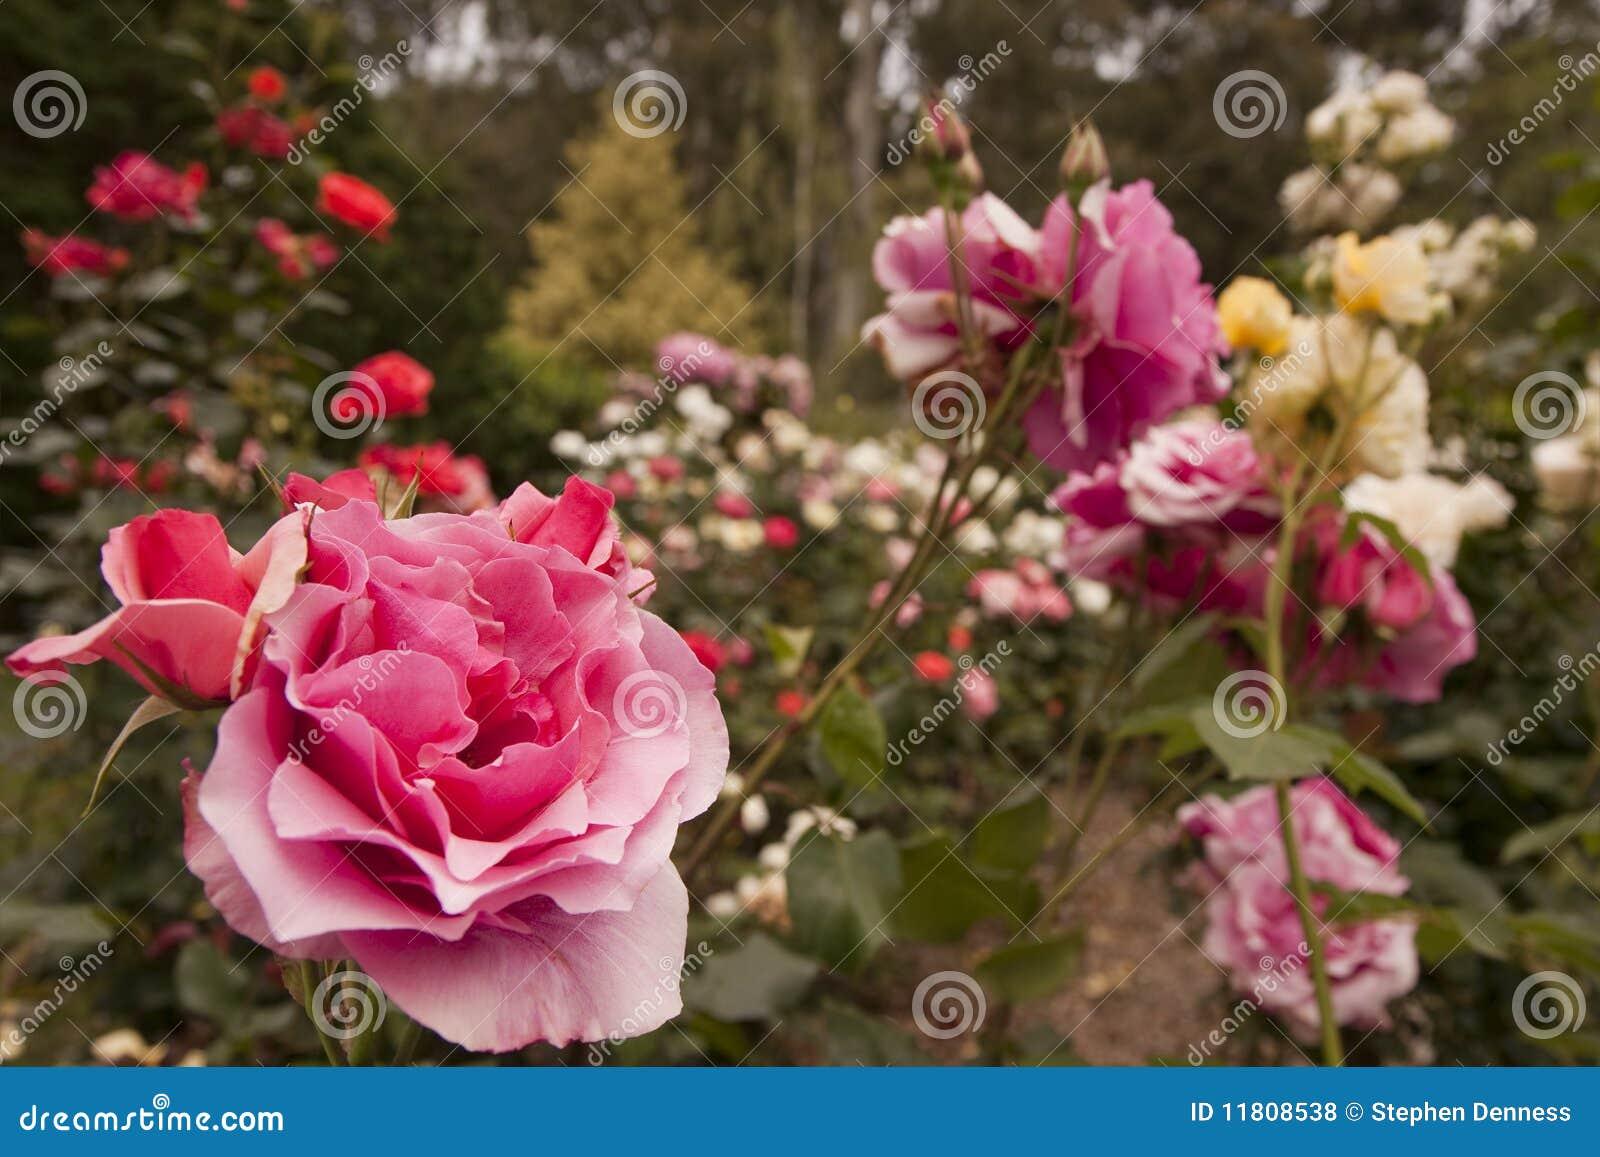 Roses In Garden: Rose Flower Garden Royalty Free Stock Photos